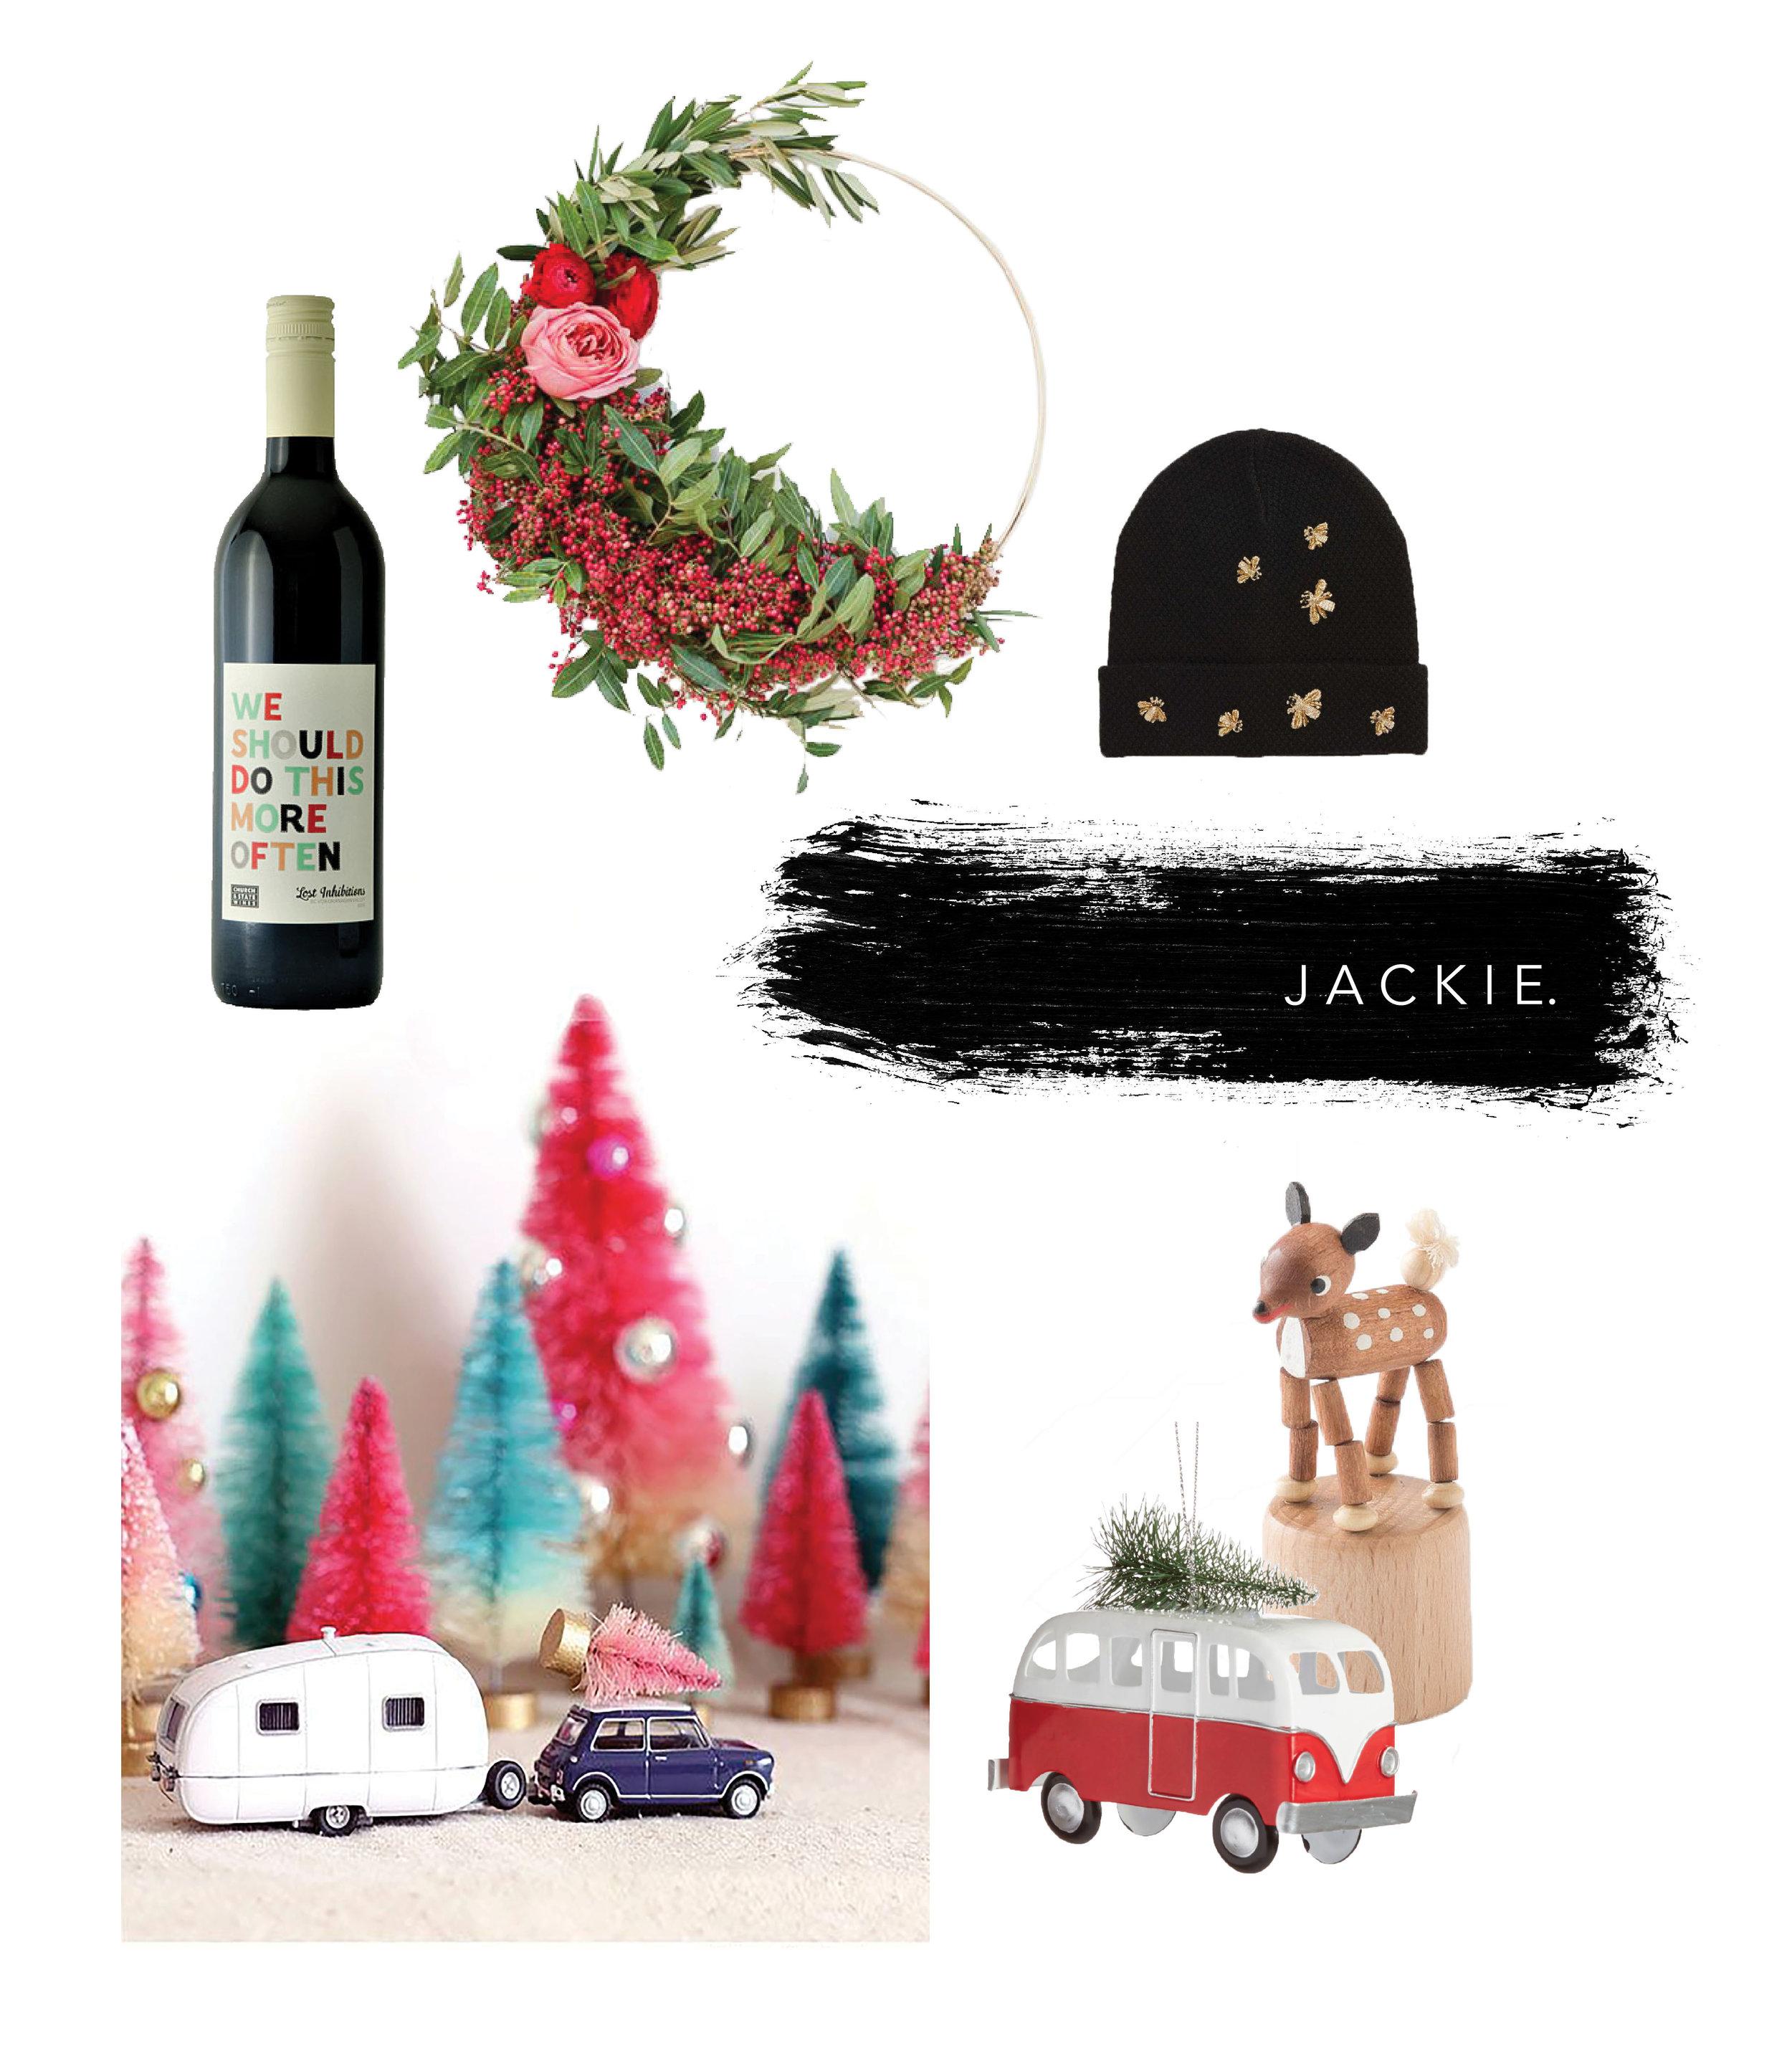 Nyla Free Designs, Jackie, Staff Picks, Christmas 2017